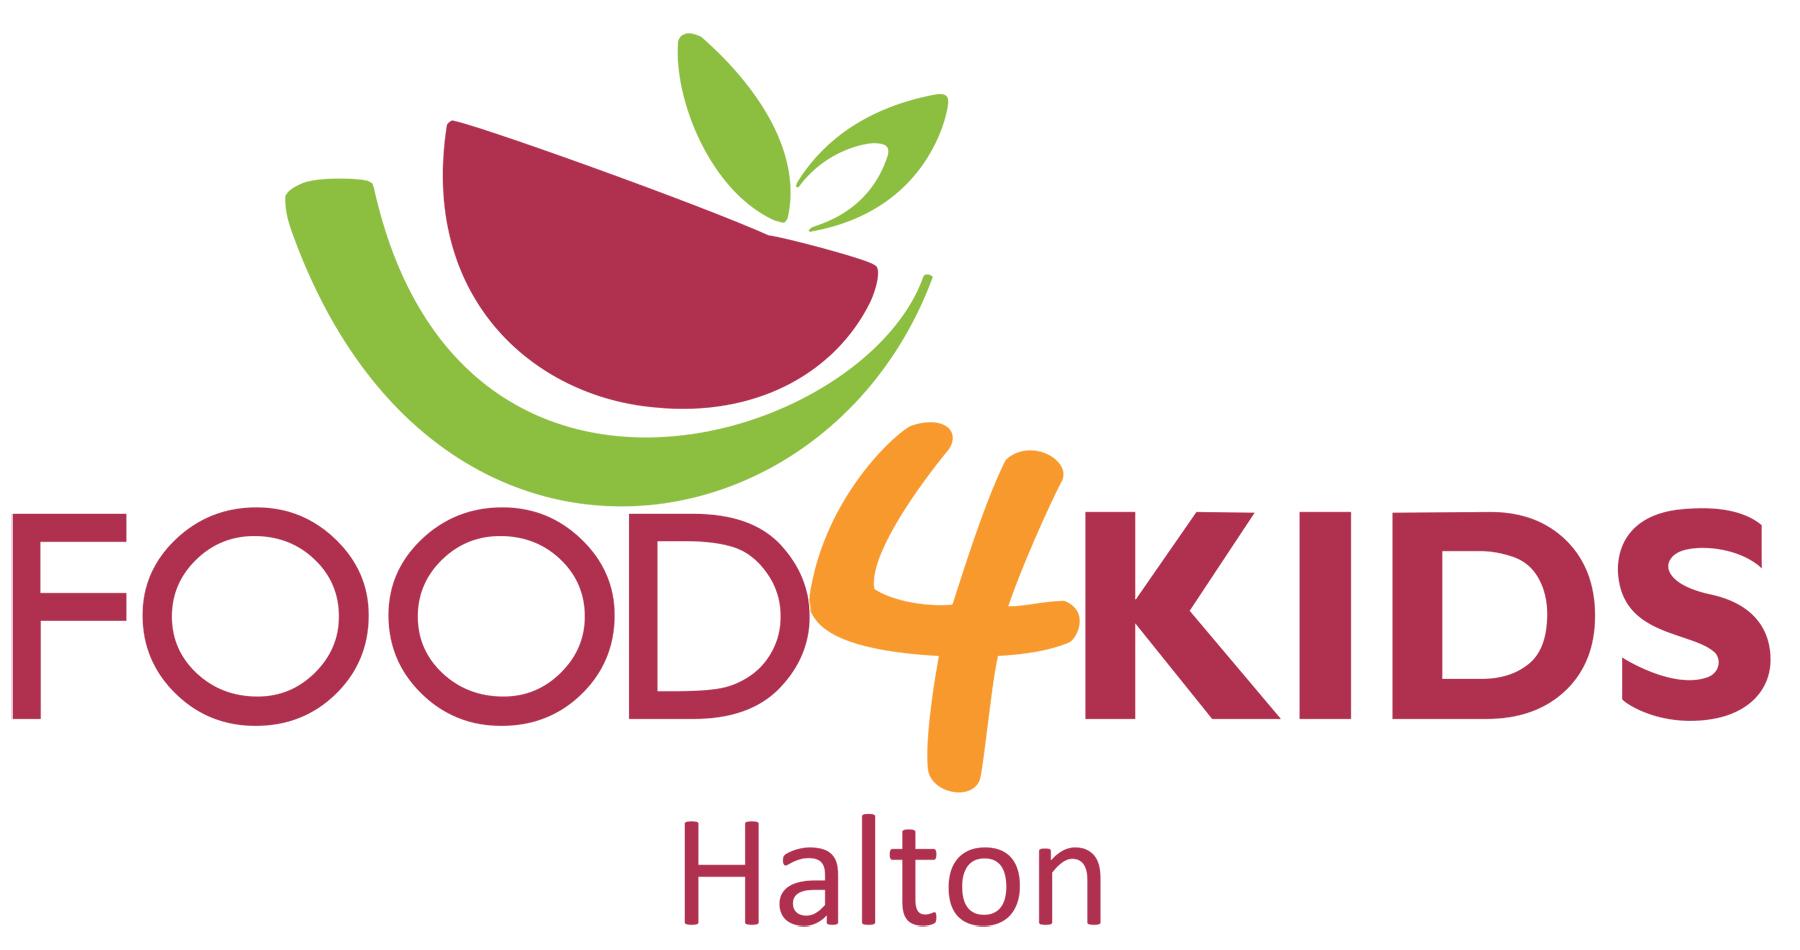 Food4Kids Halton